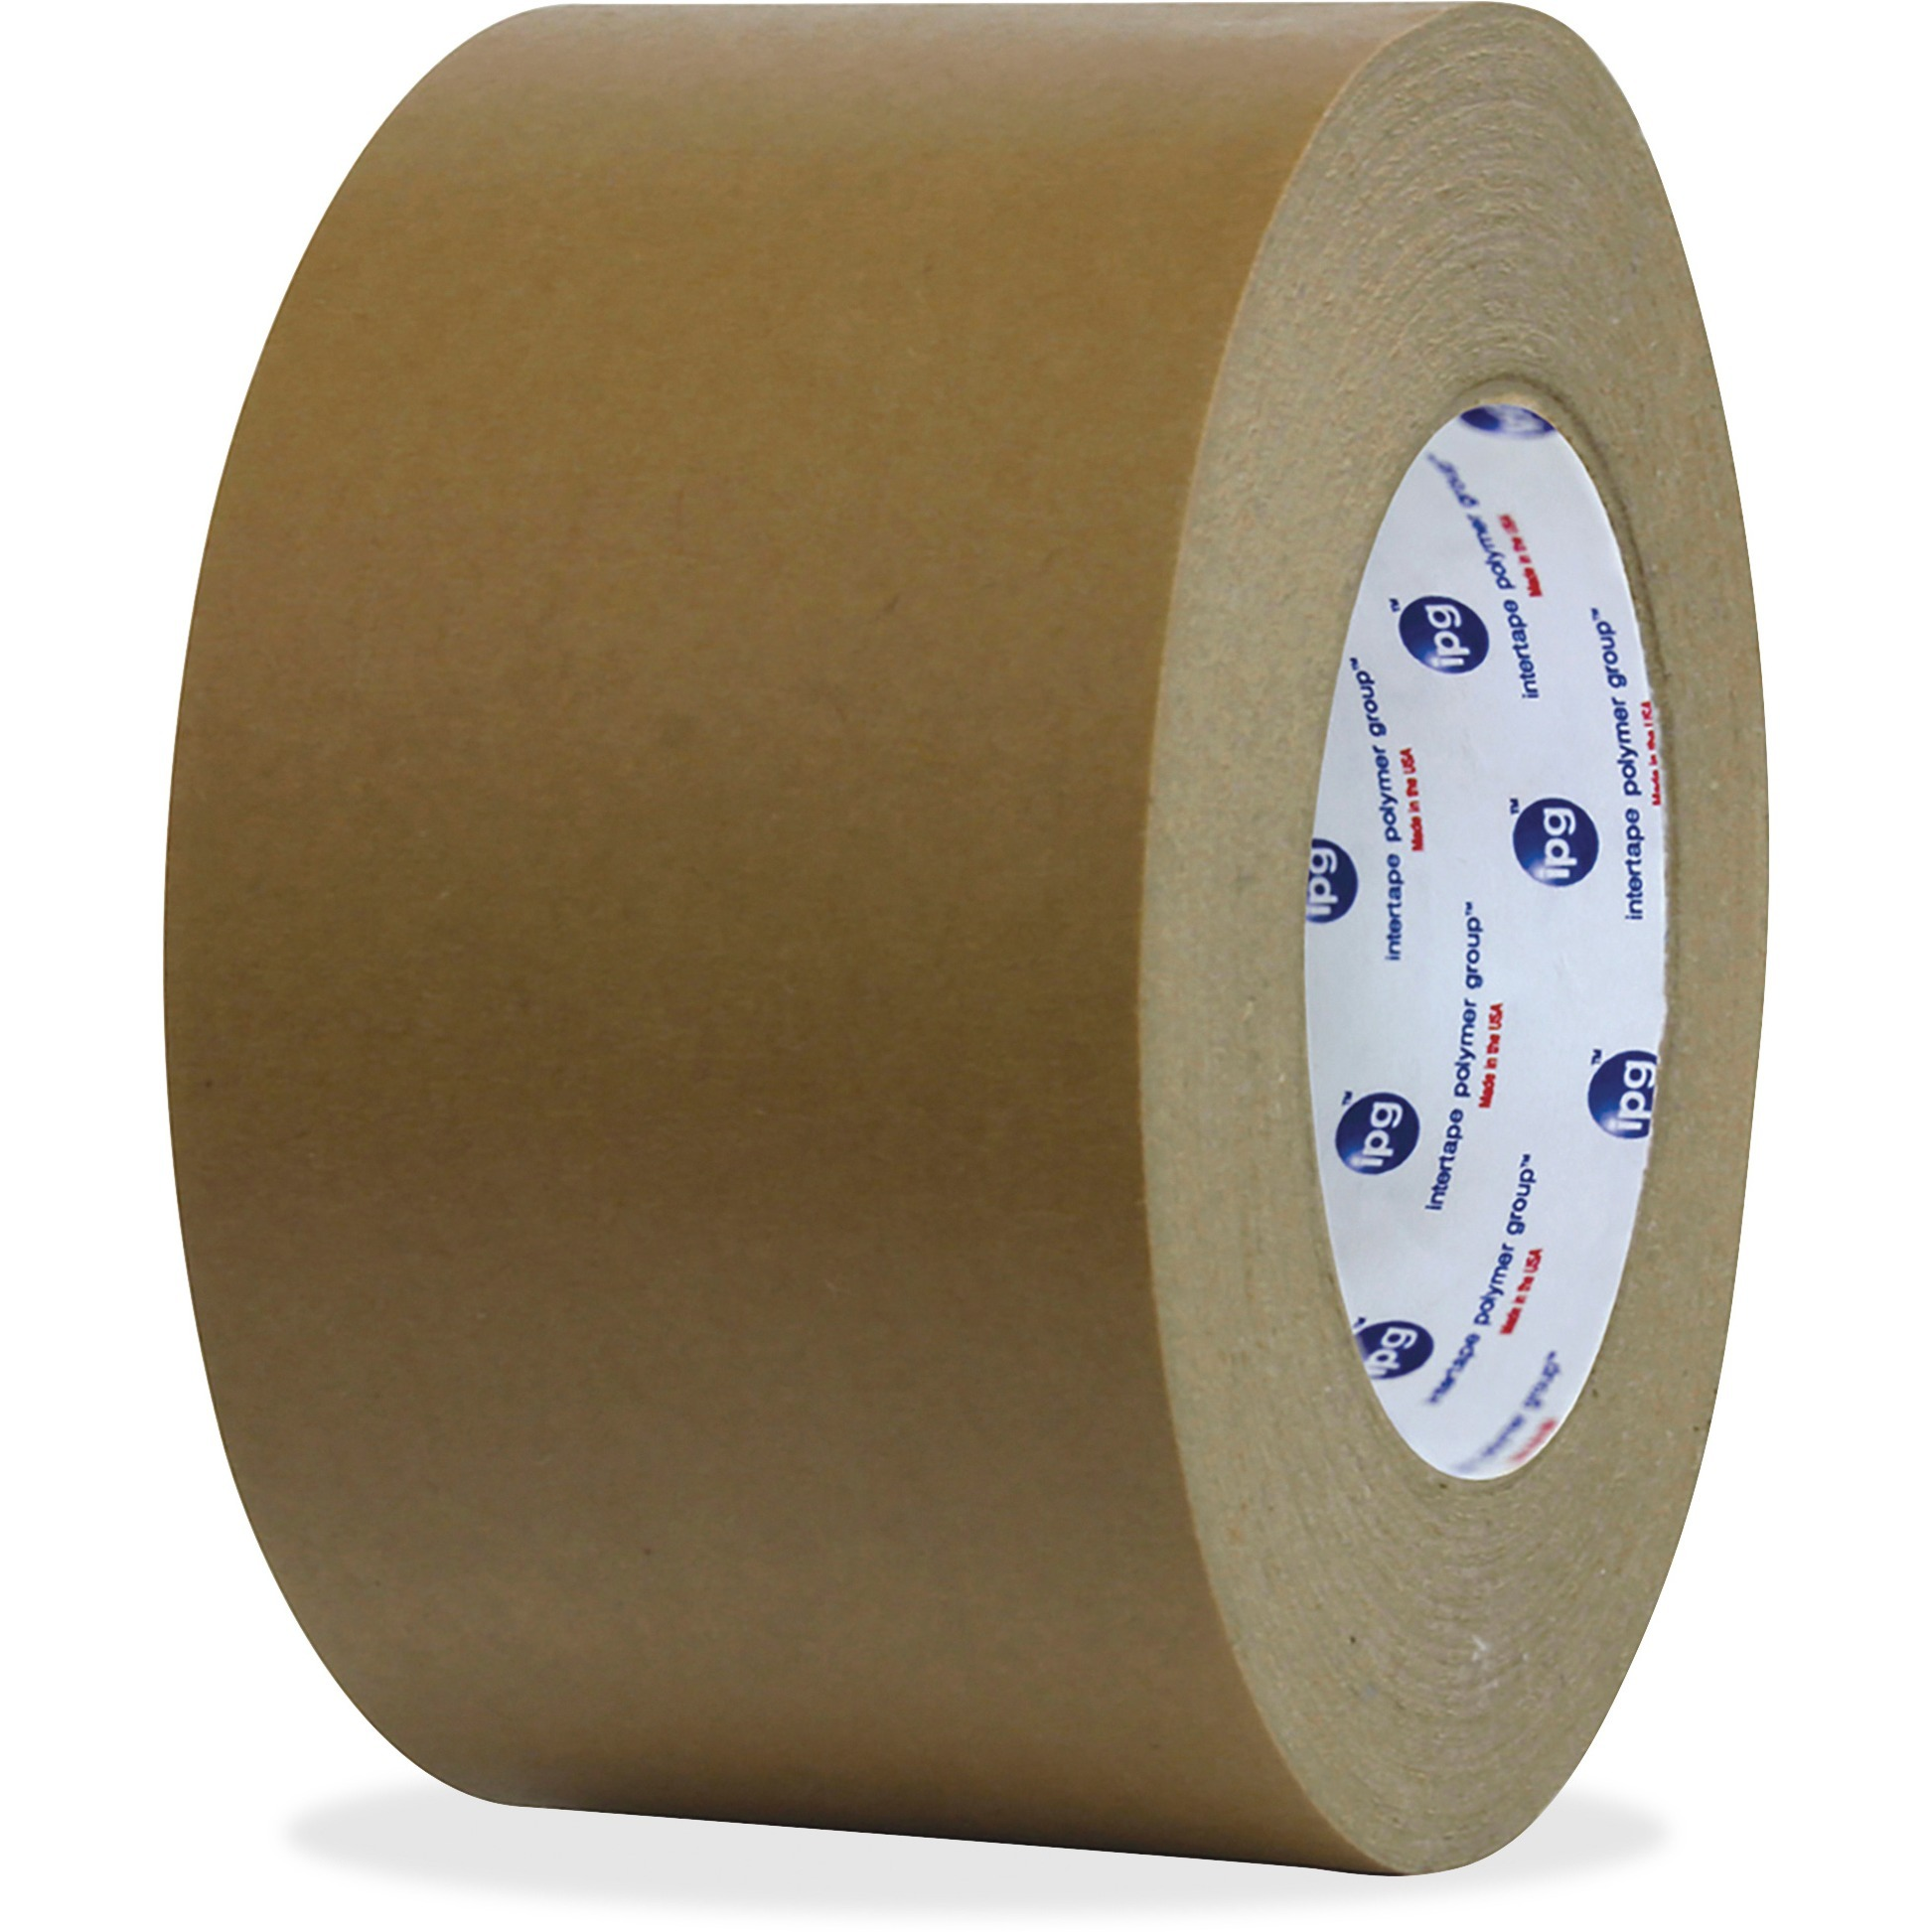 ipg, IPG71598, Medium Grade Flatback Tape, 36 / Carton, Brown